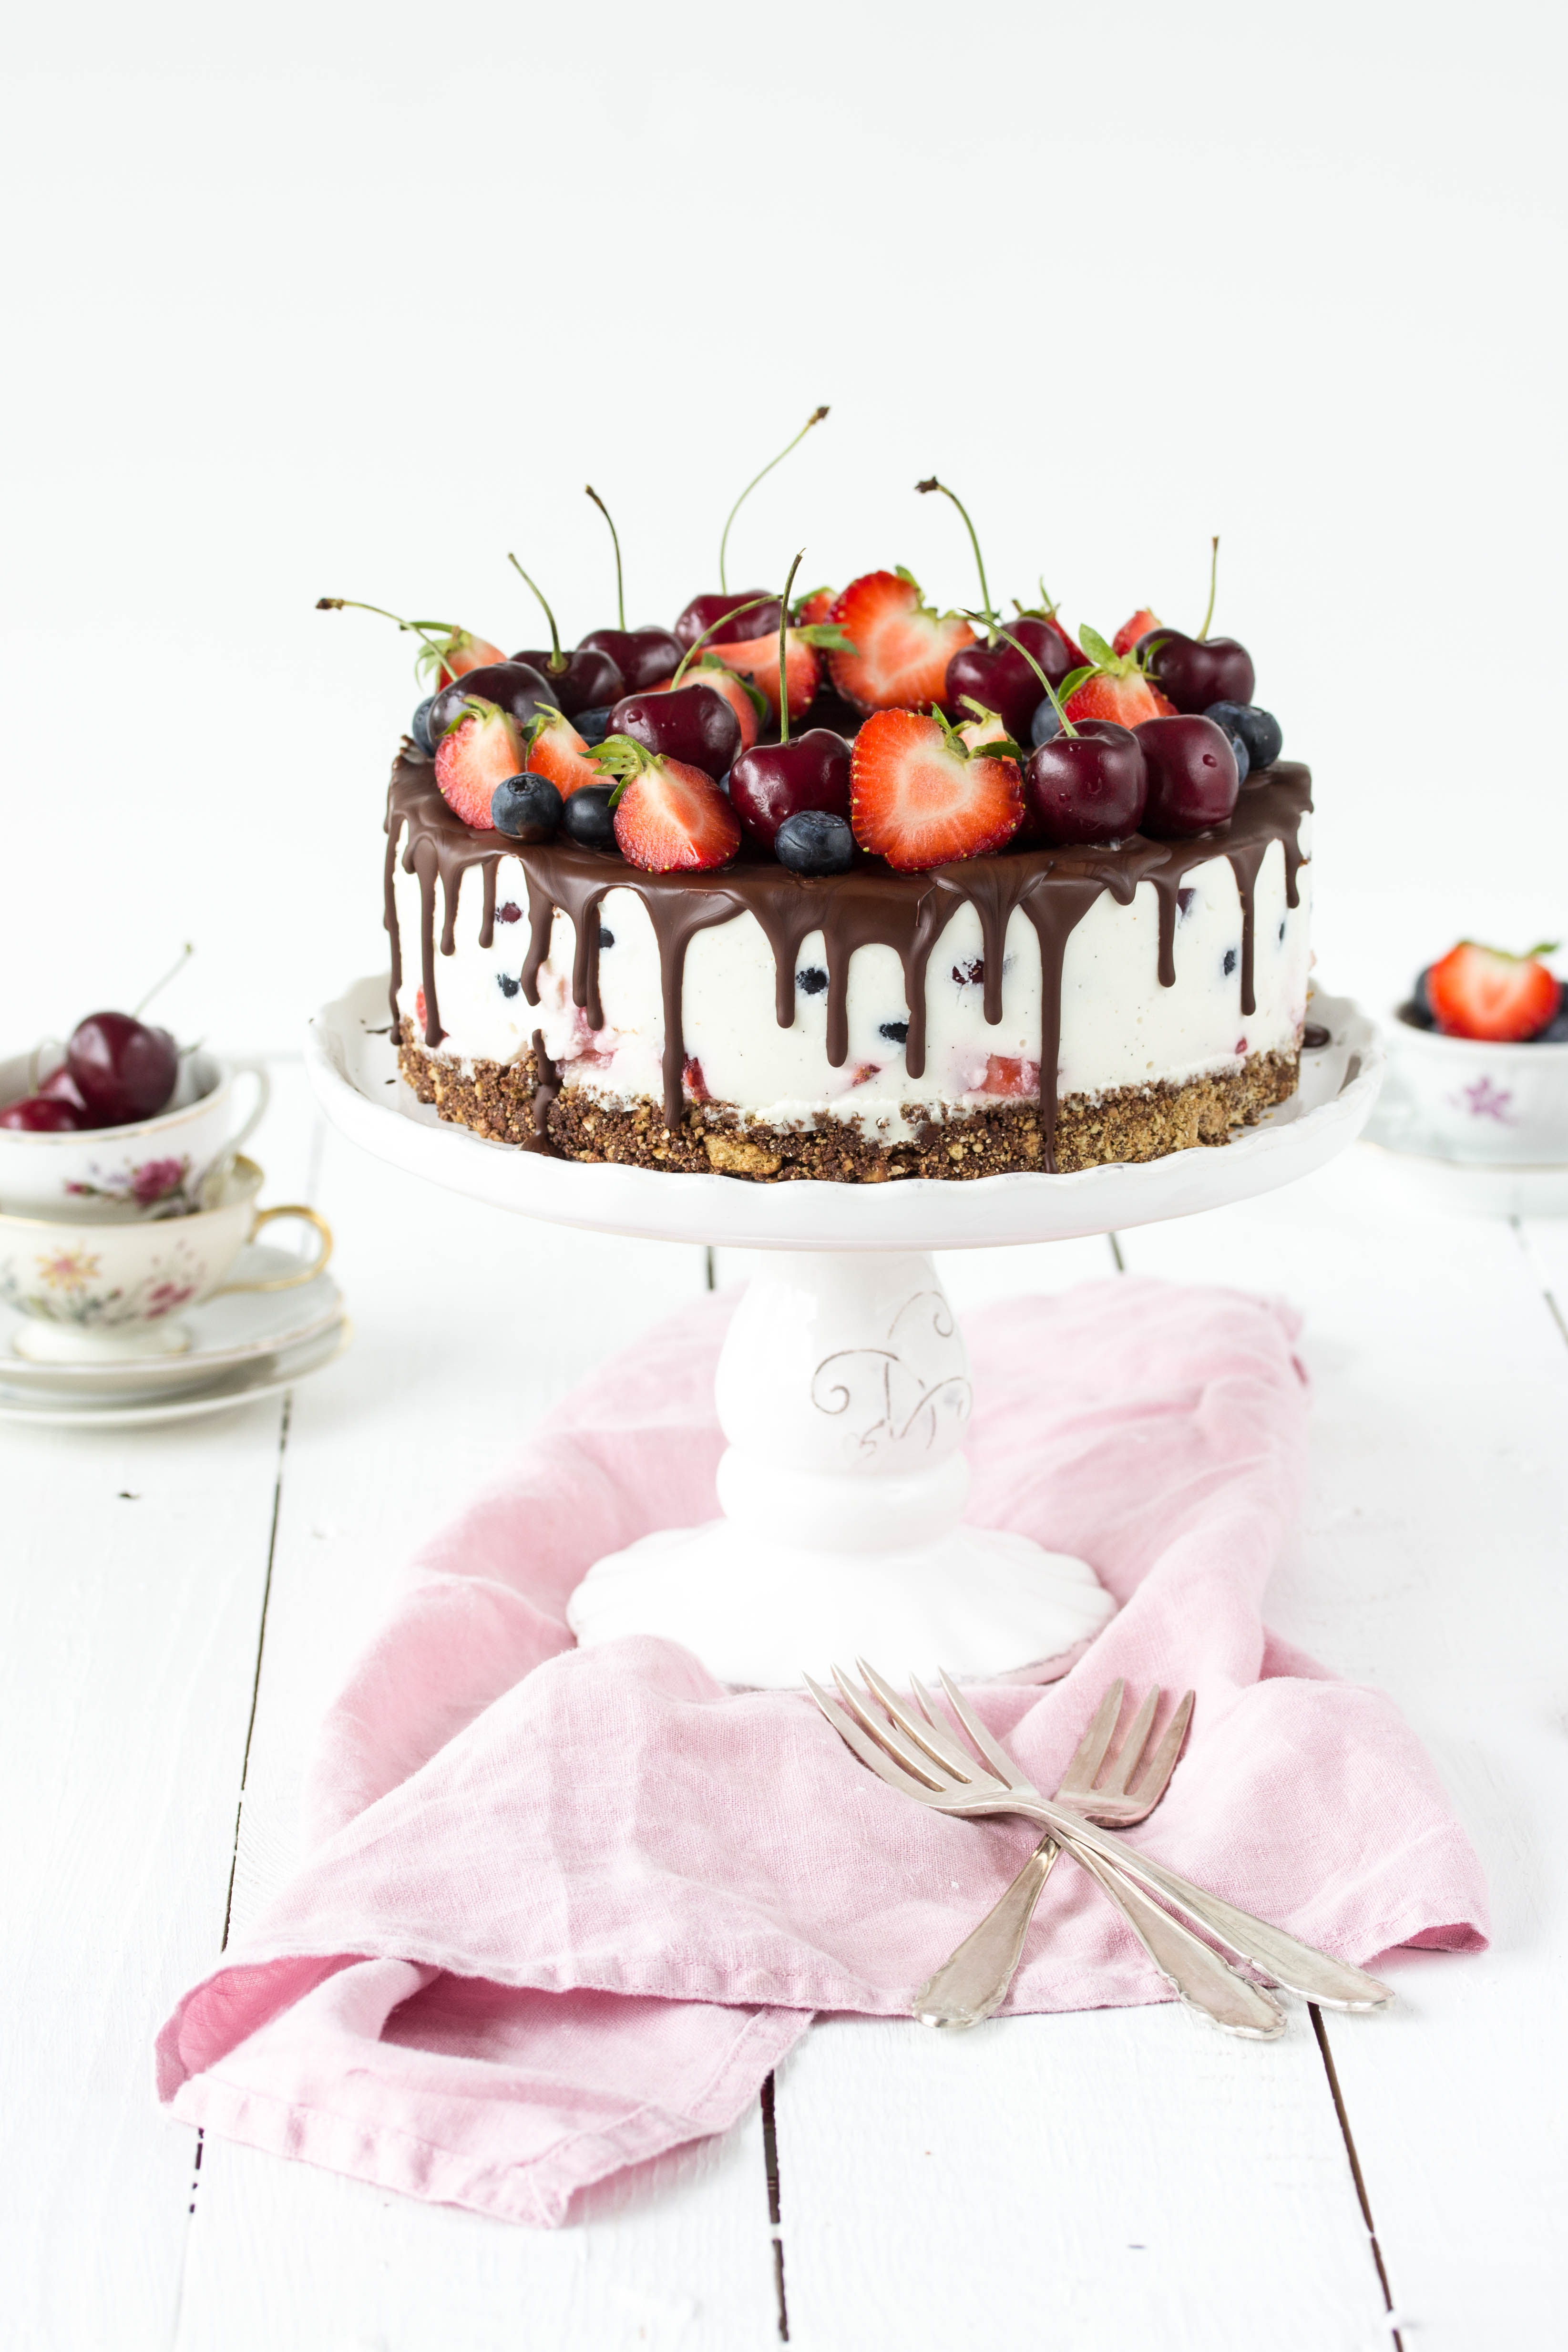 Beeren Drip Cake: Rezept ohne Backen mit Erdbeeren, Blaubeeren, Himbeeren und Kirschen #Torte #ohnebacken #cake #Beeren #Dripcake | Emma´s Lieblingsstücke